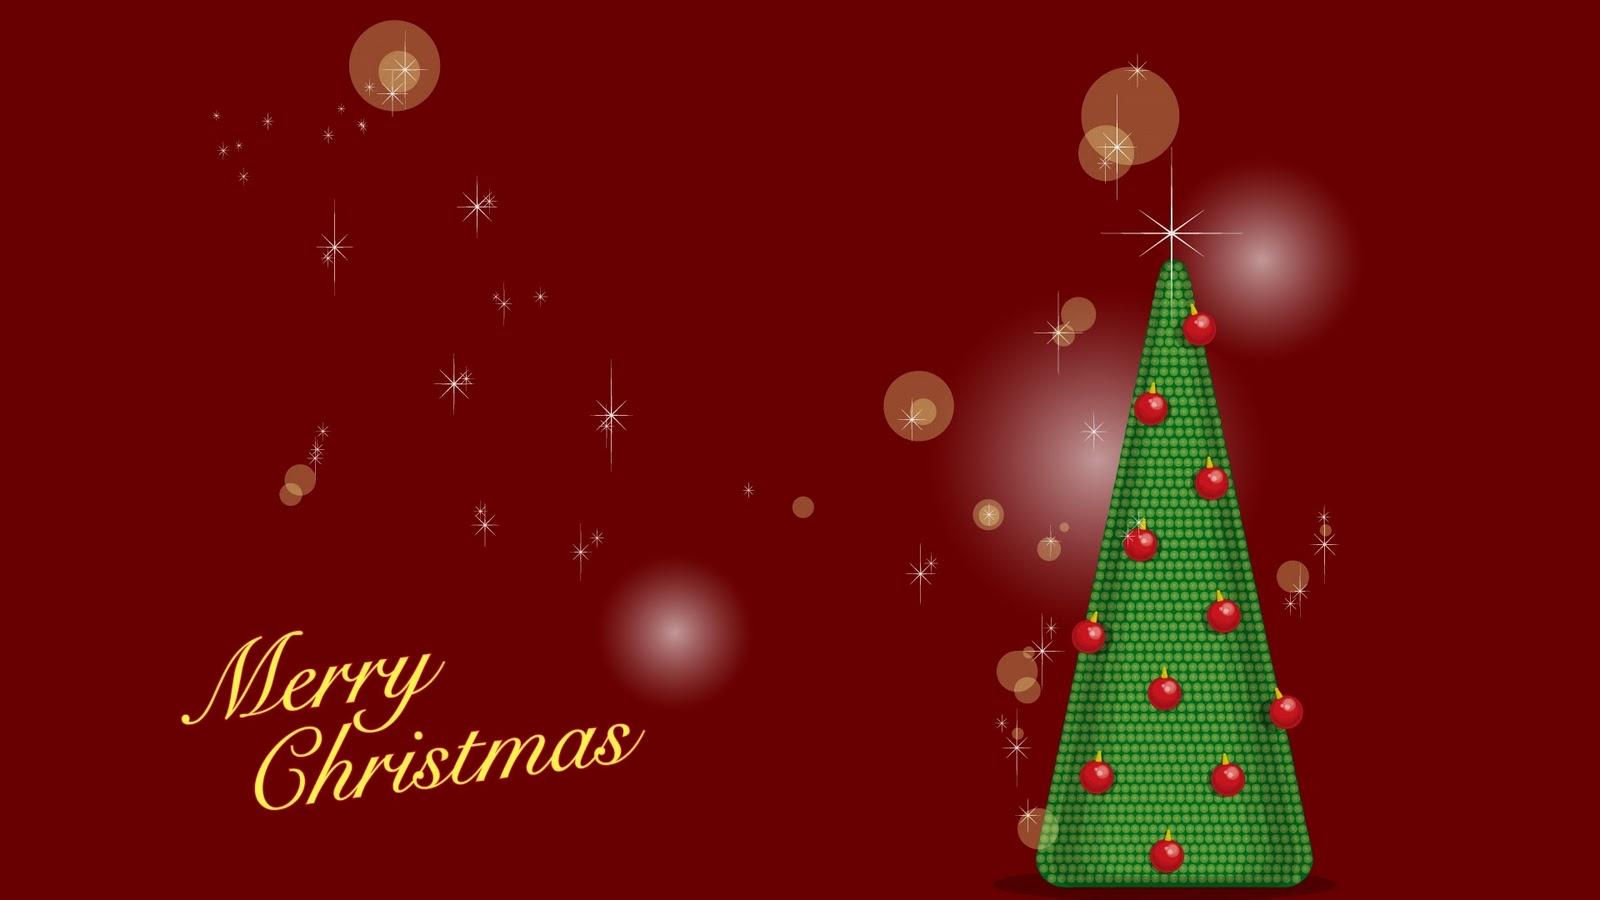 New year christmas celebration PPT Backgrounds